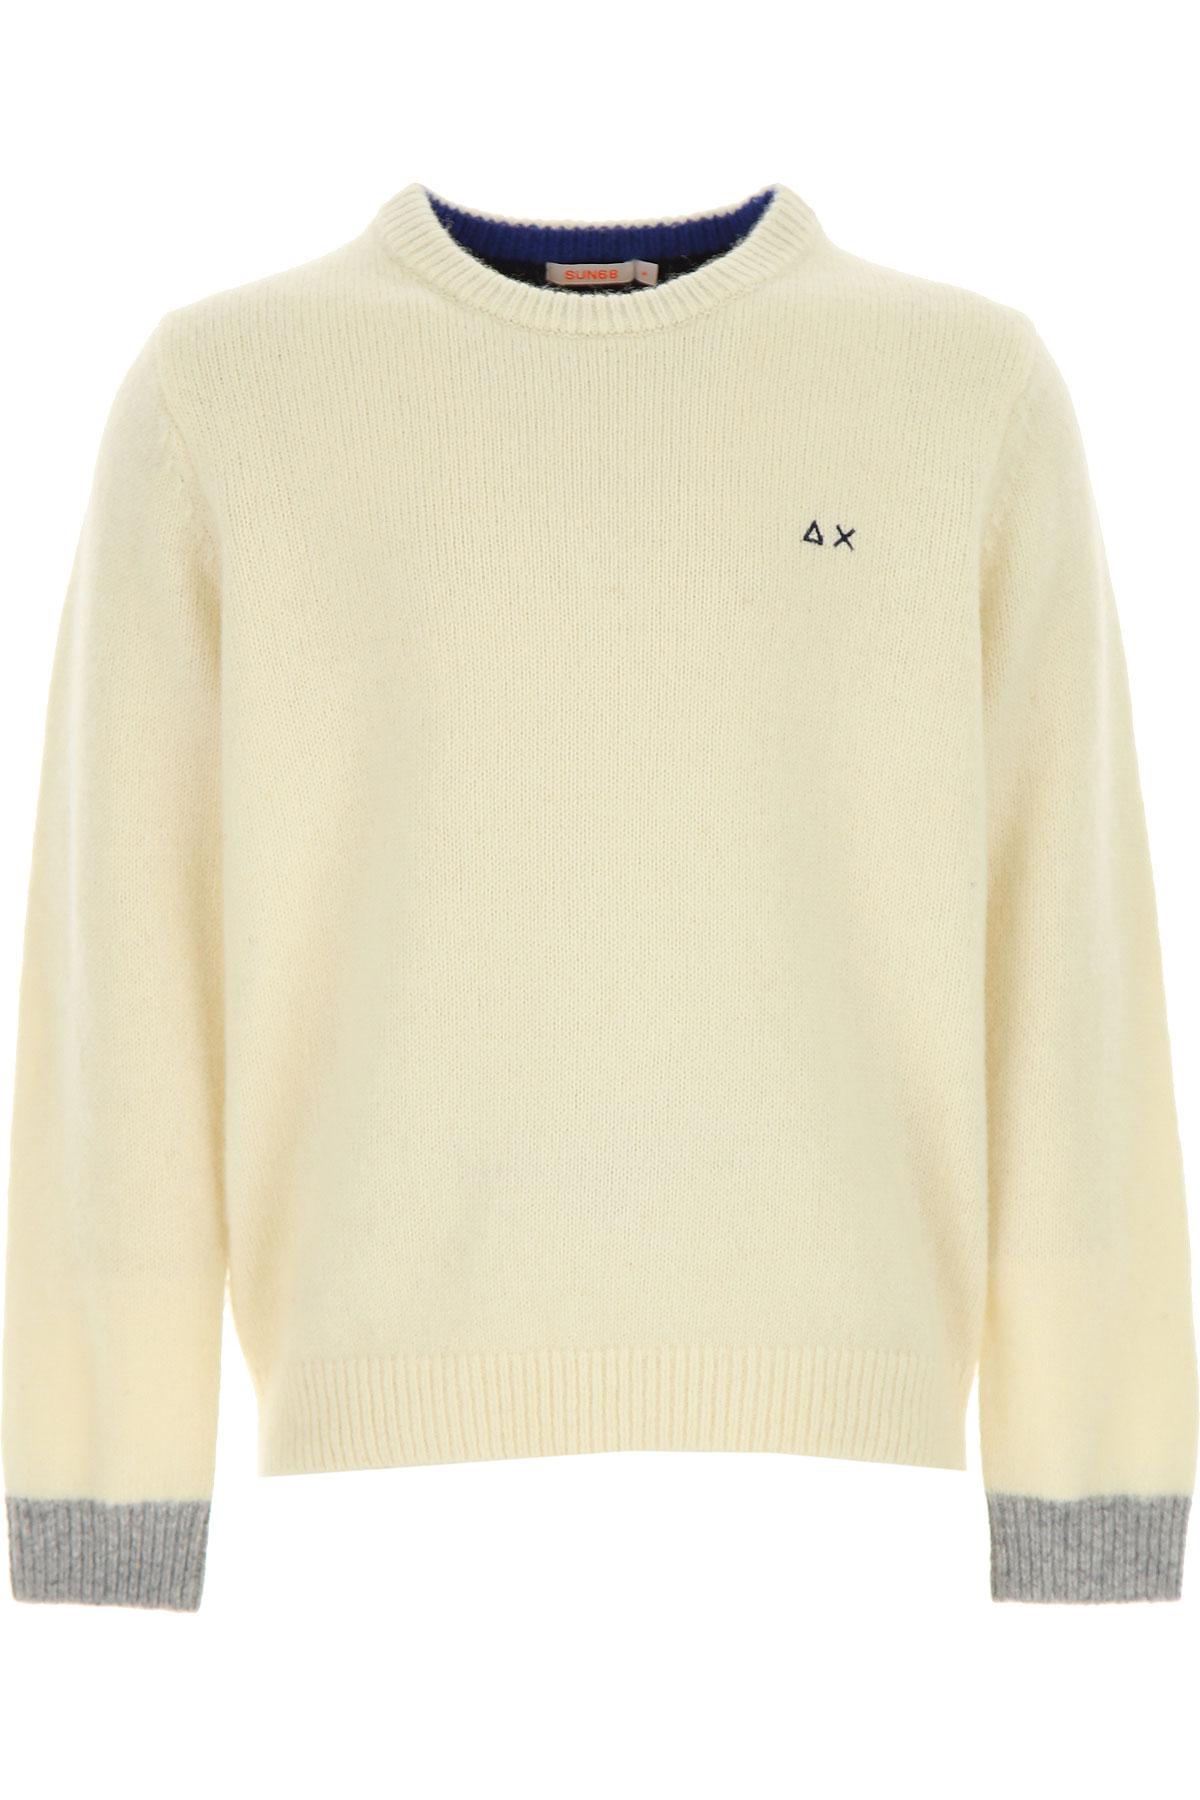 Sun68 Kids Sweaters for Boys On Sale, Cream, Wool, 2019, 12Y 4Y 6Y